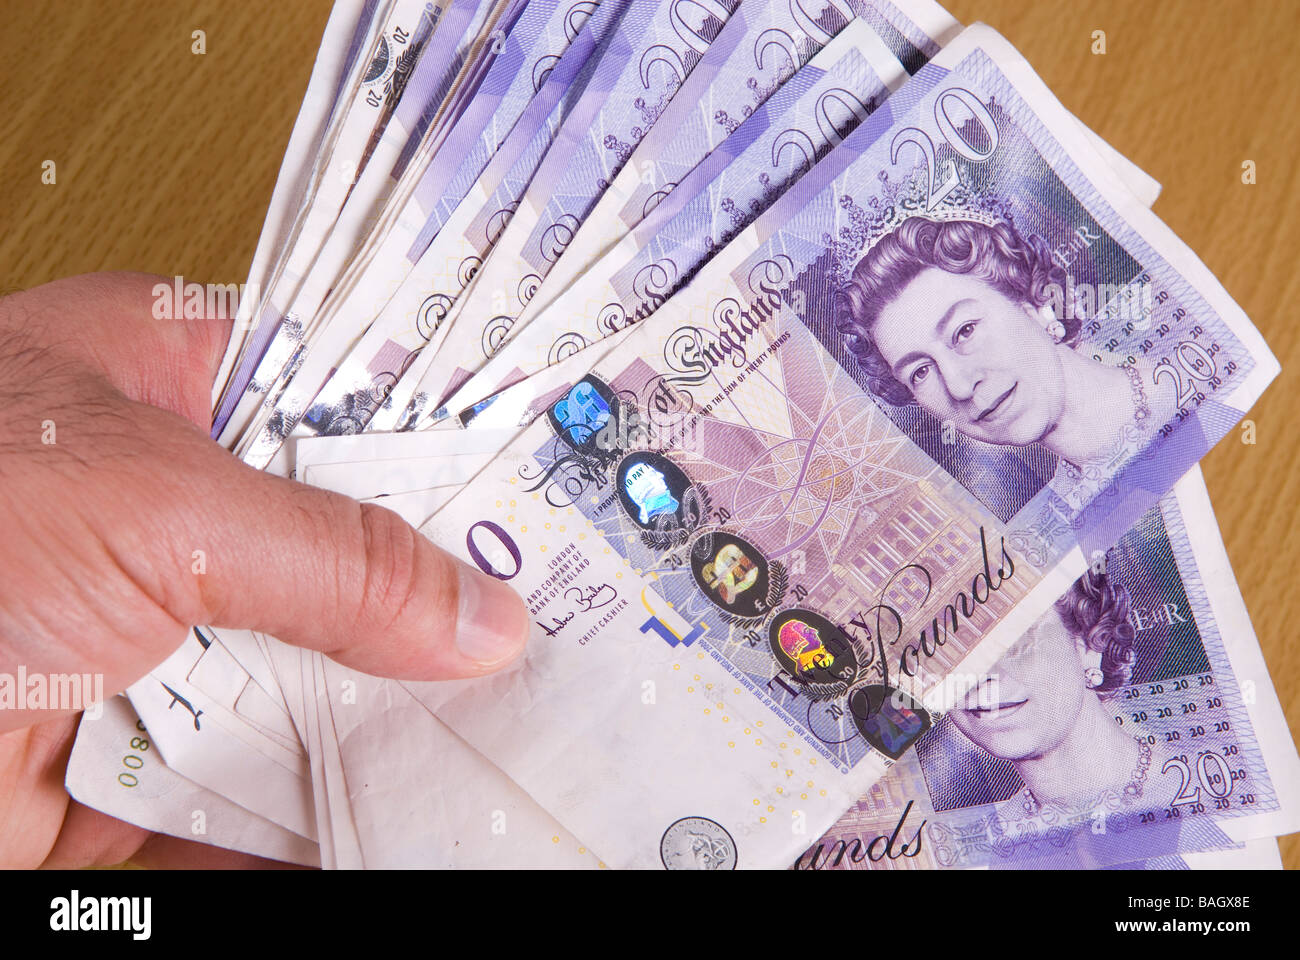 Hand holding British Money - Stock Image